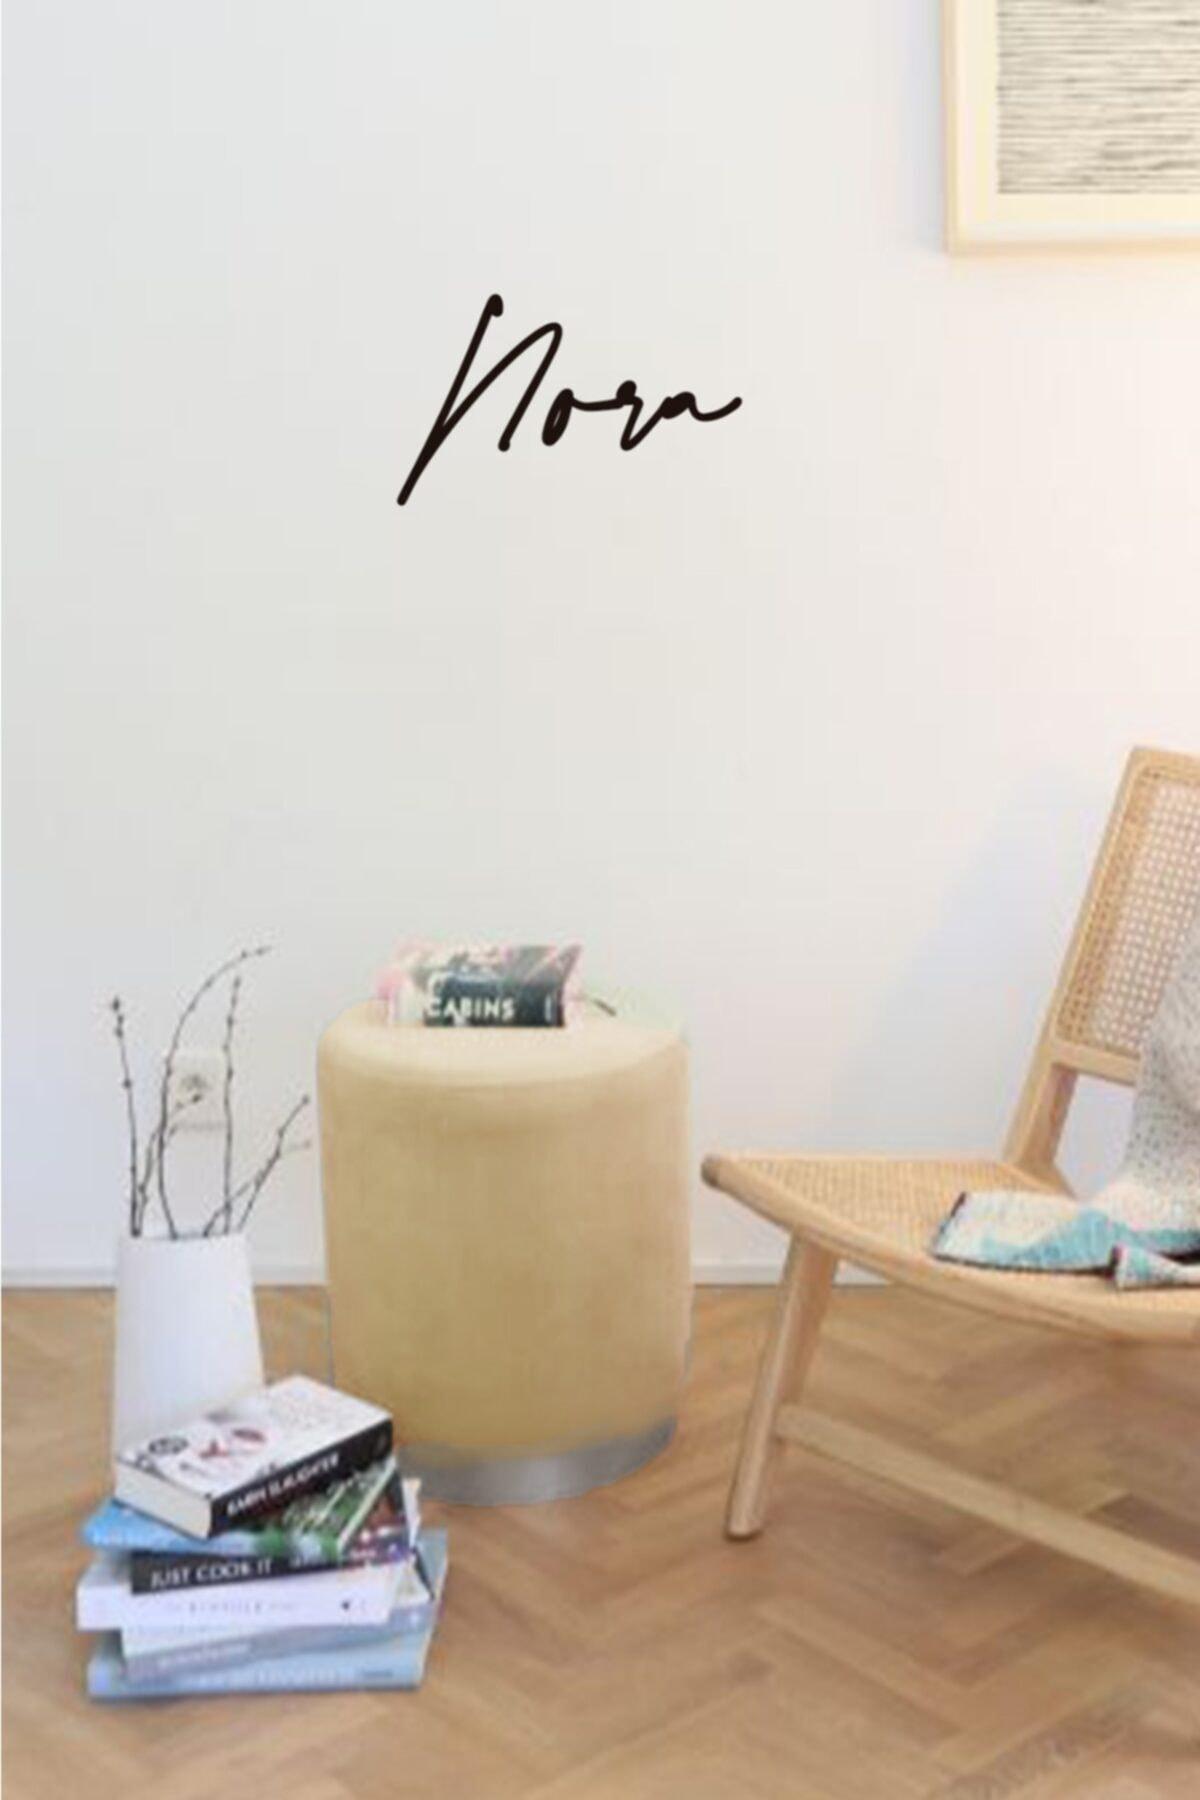 Zem Nora Silinebilir Puf - Cream Silver 1